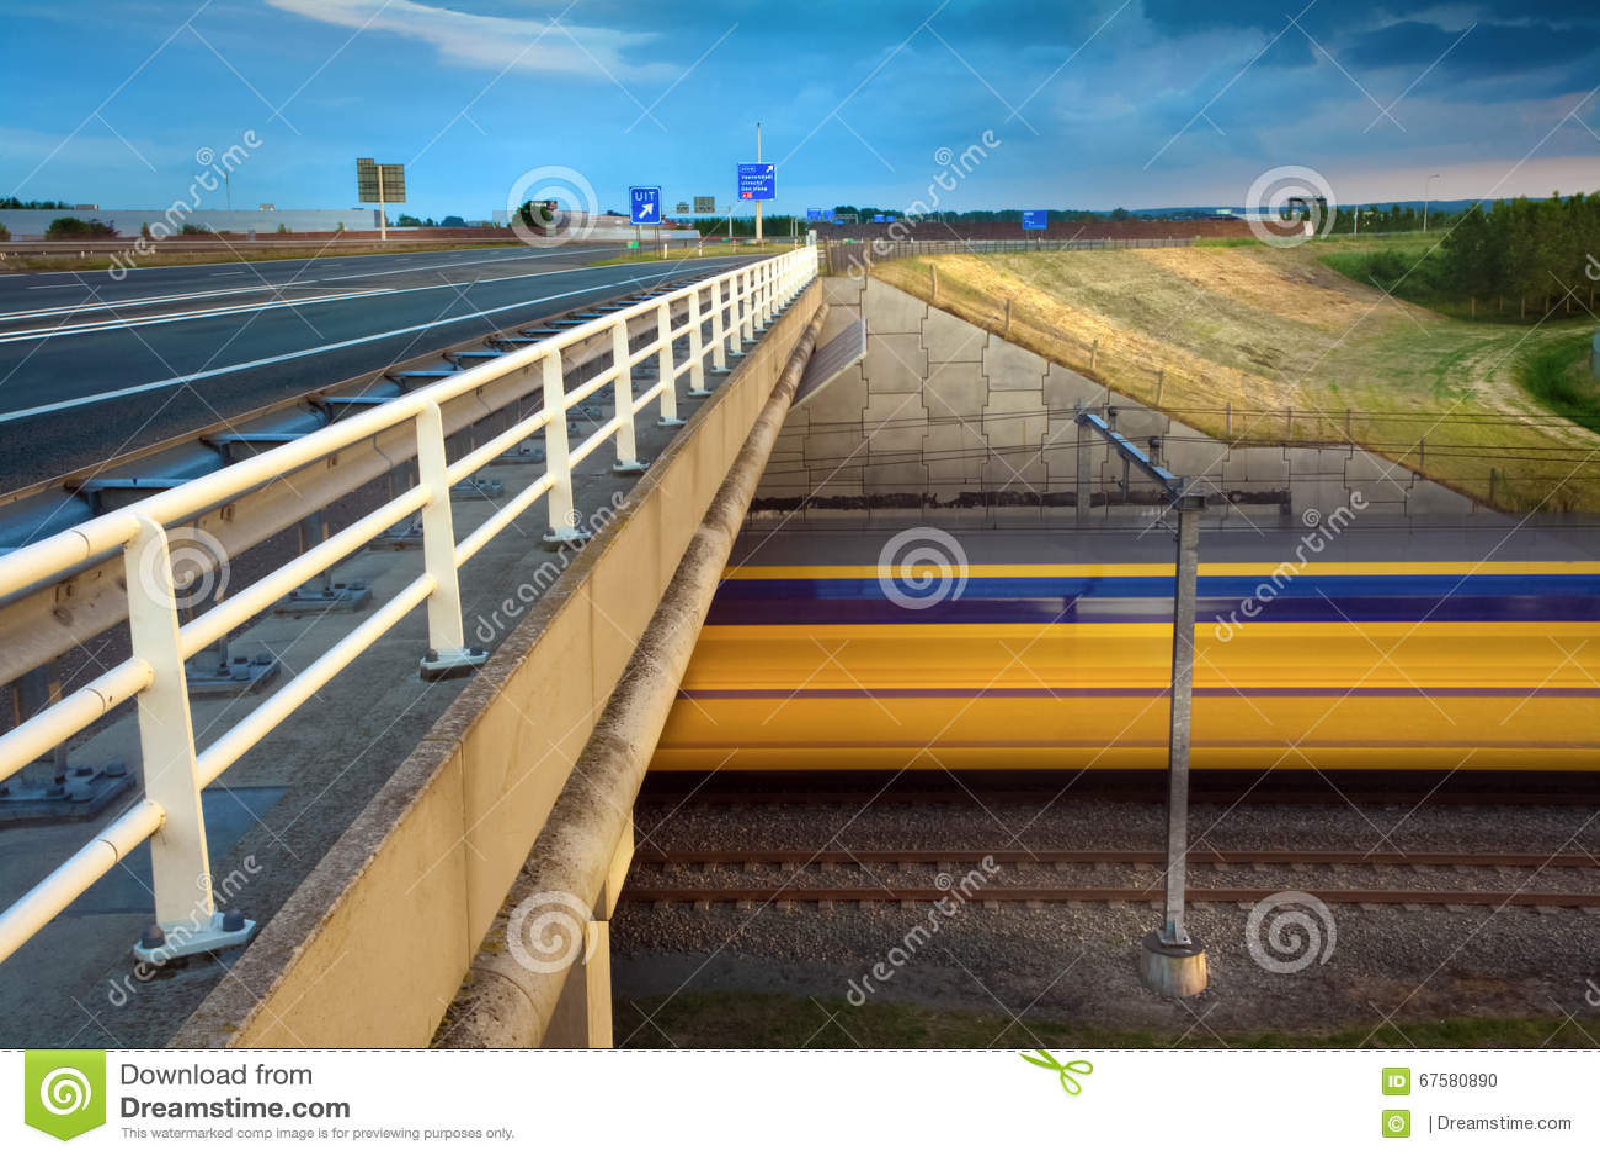 Zamazany film Intercity pociąg